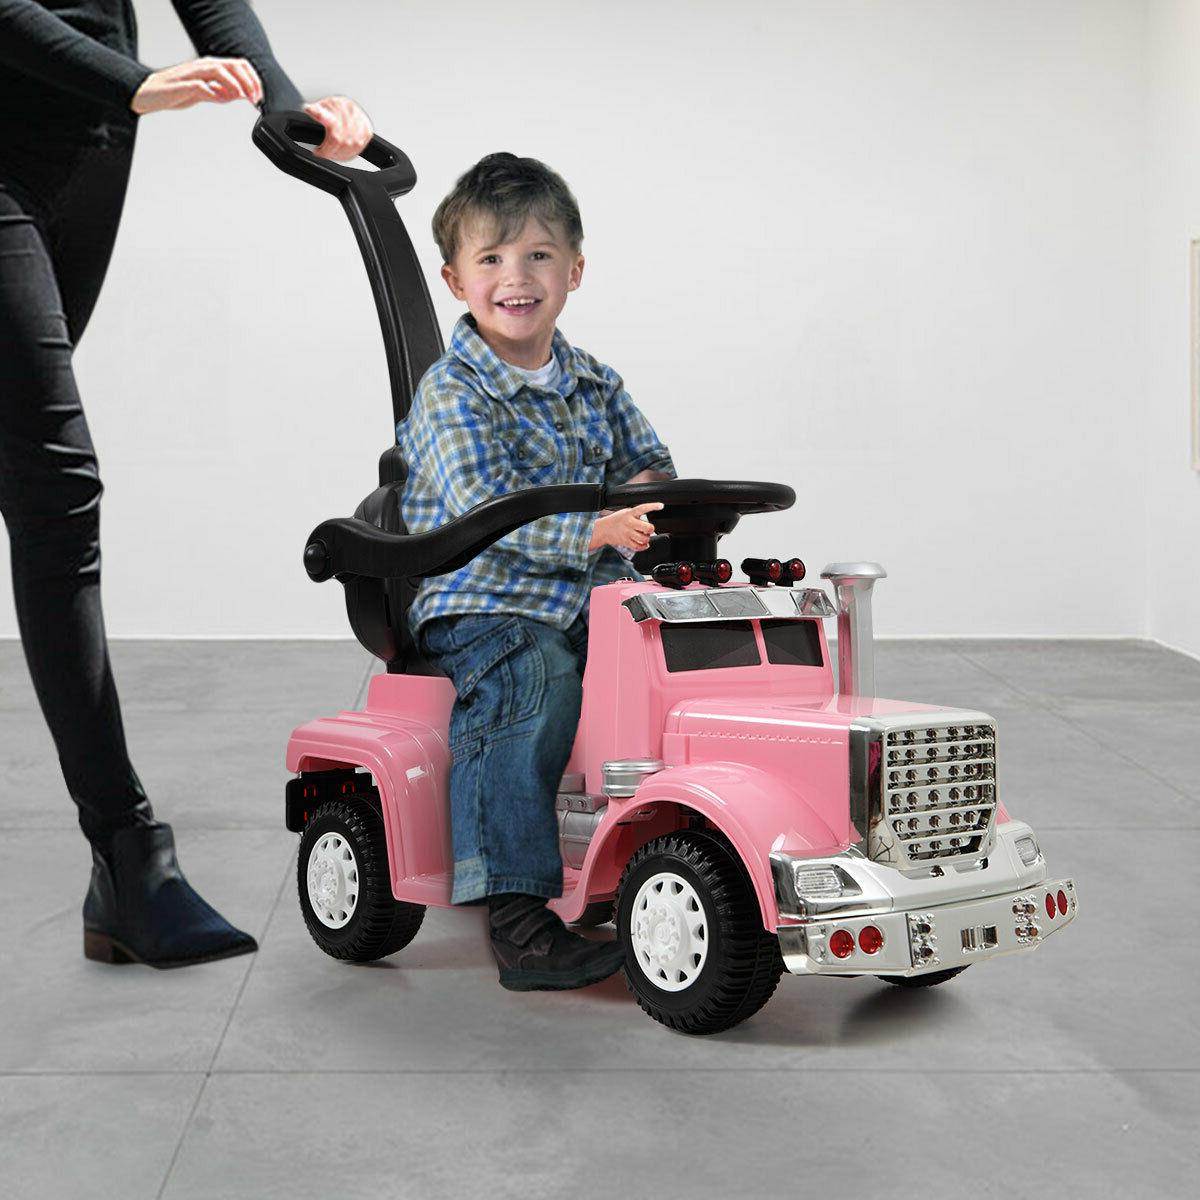 1-3 age Kids Ride On Push Car Stroller Toddler Wagon w/ Hand